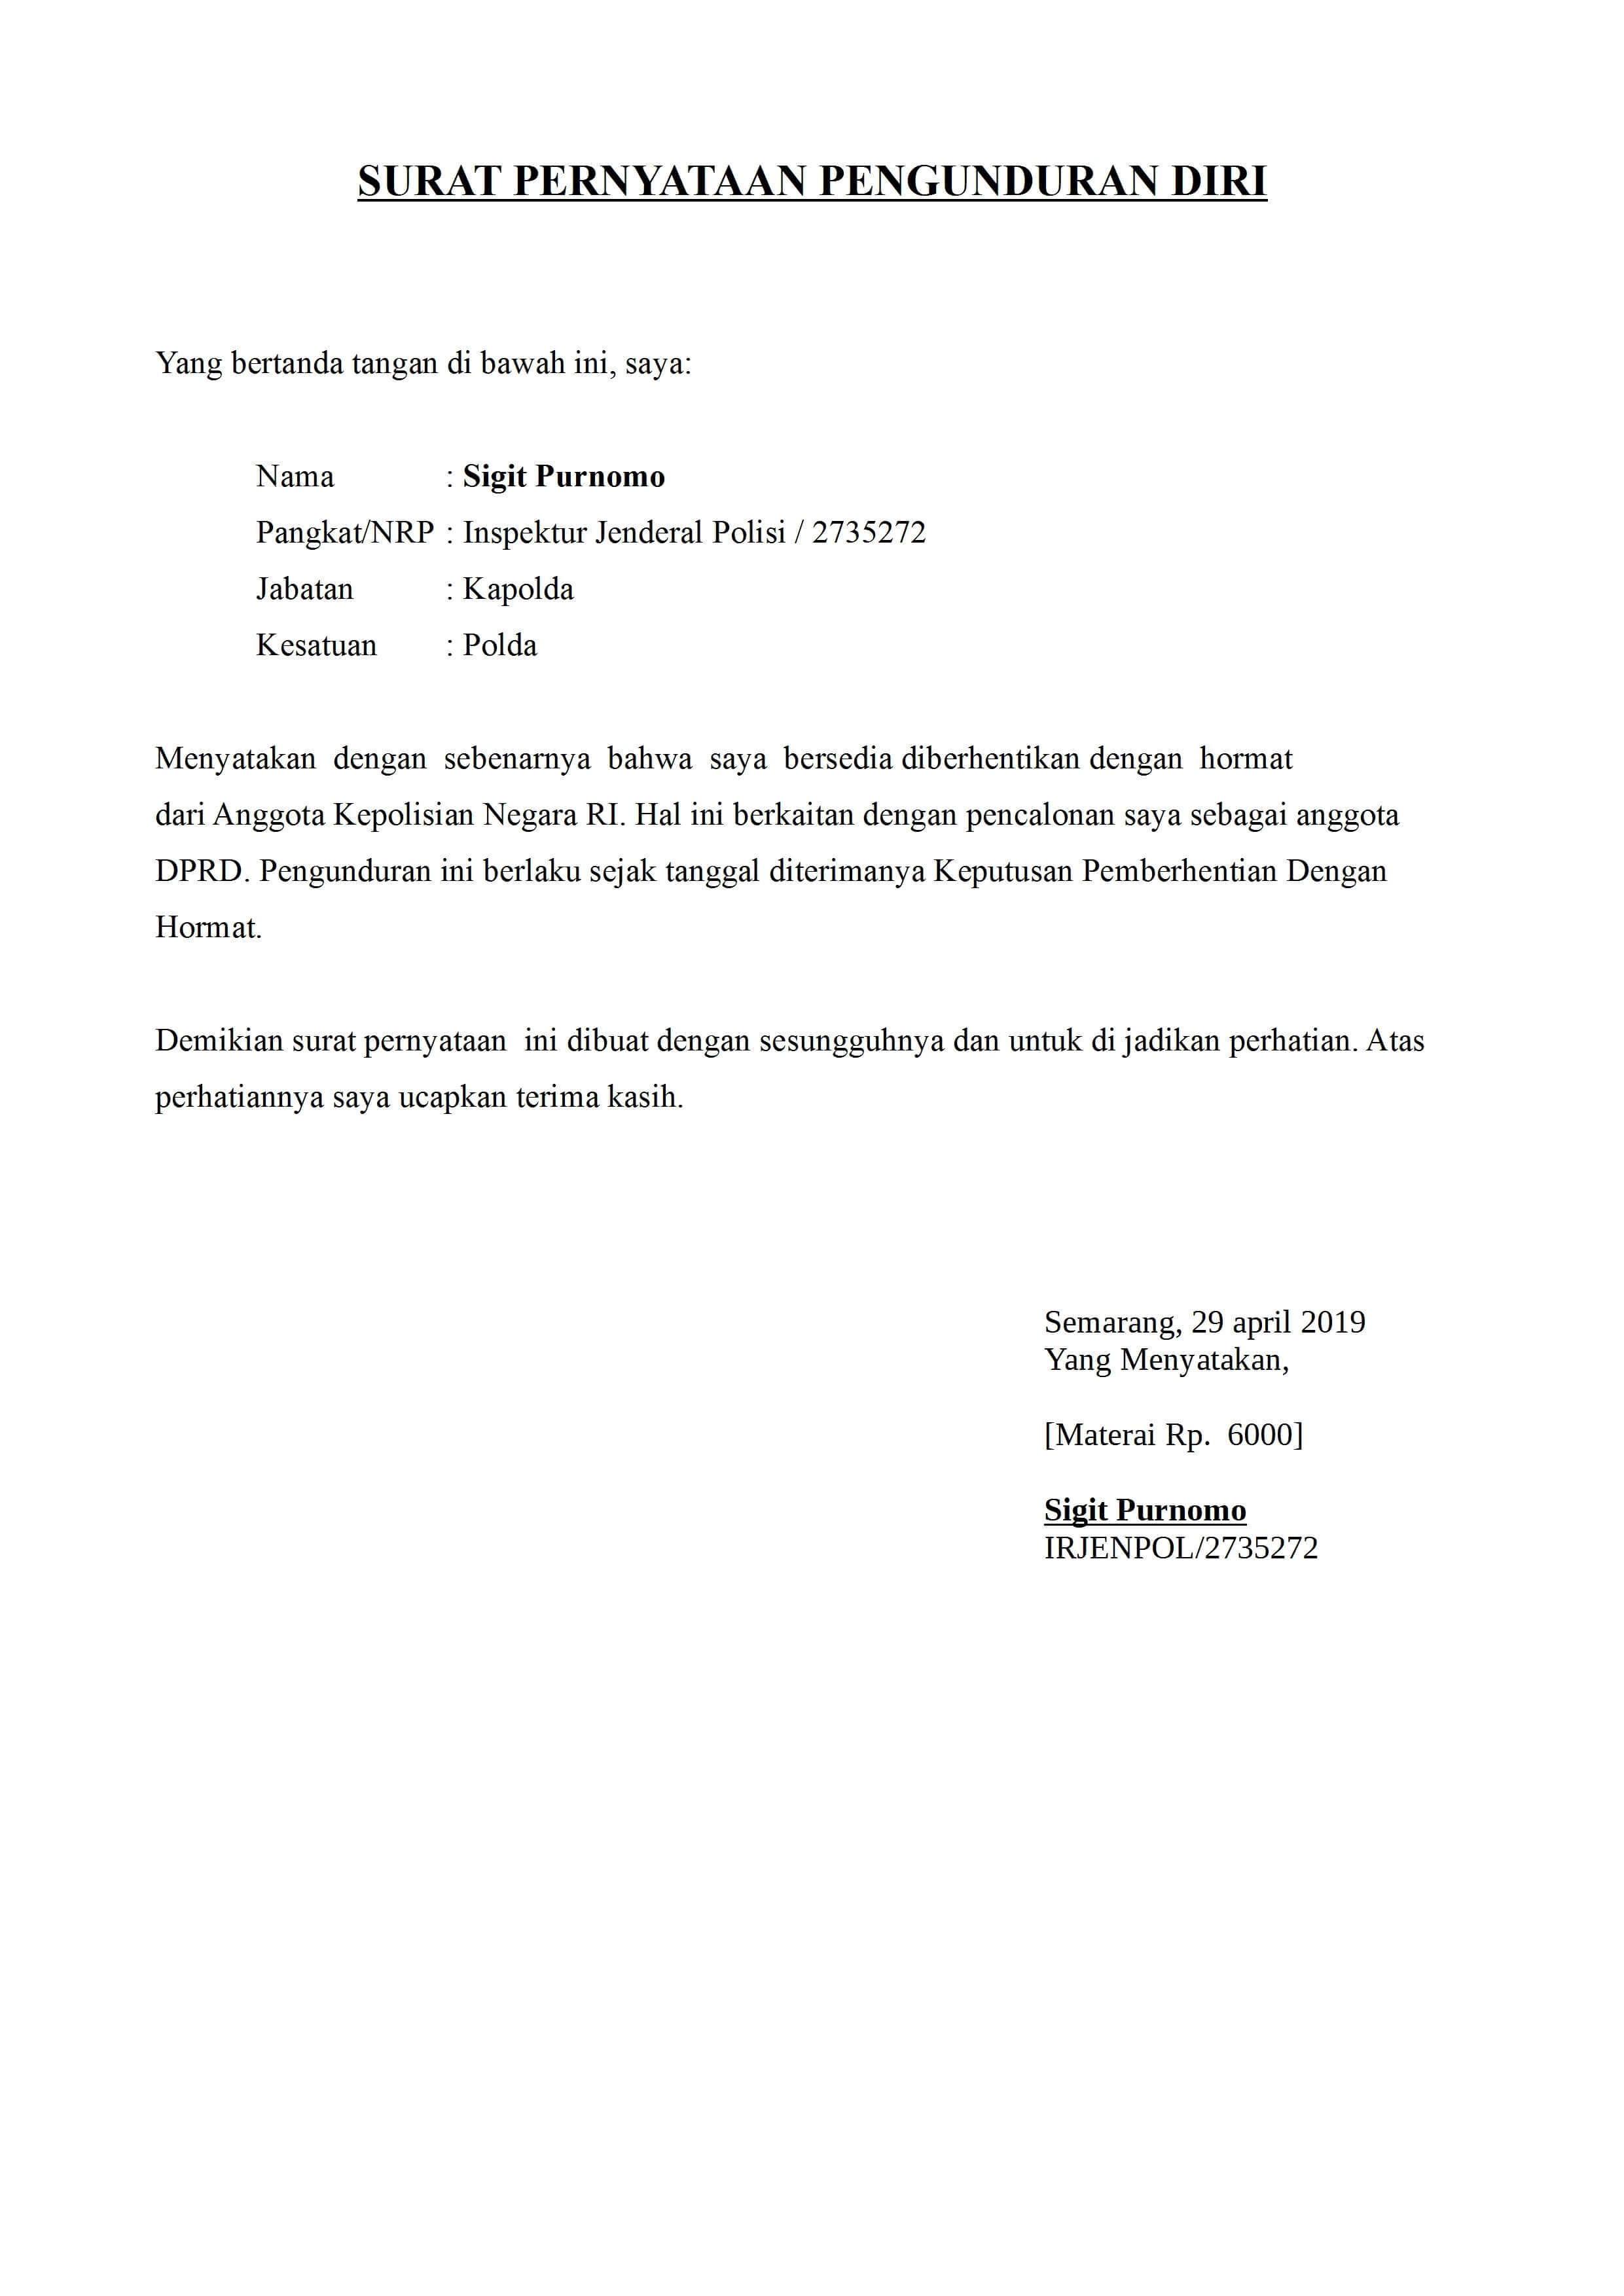 Contoh Surat Pengunduran Diri Pt Alfamart Contoh Surat